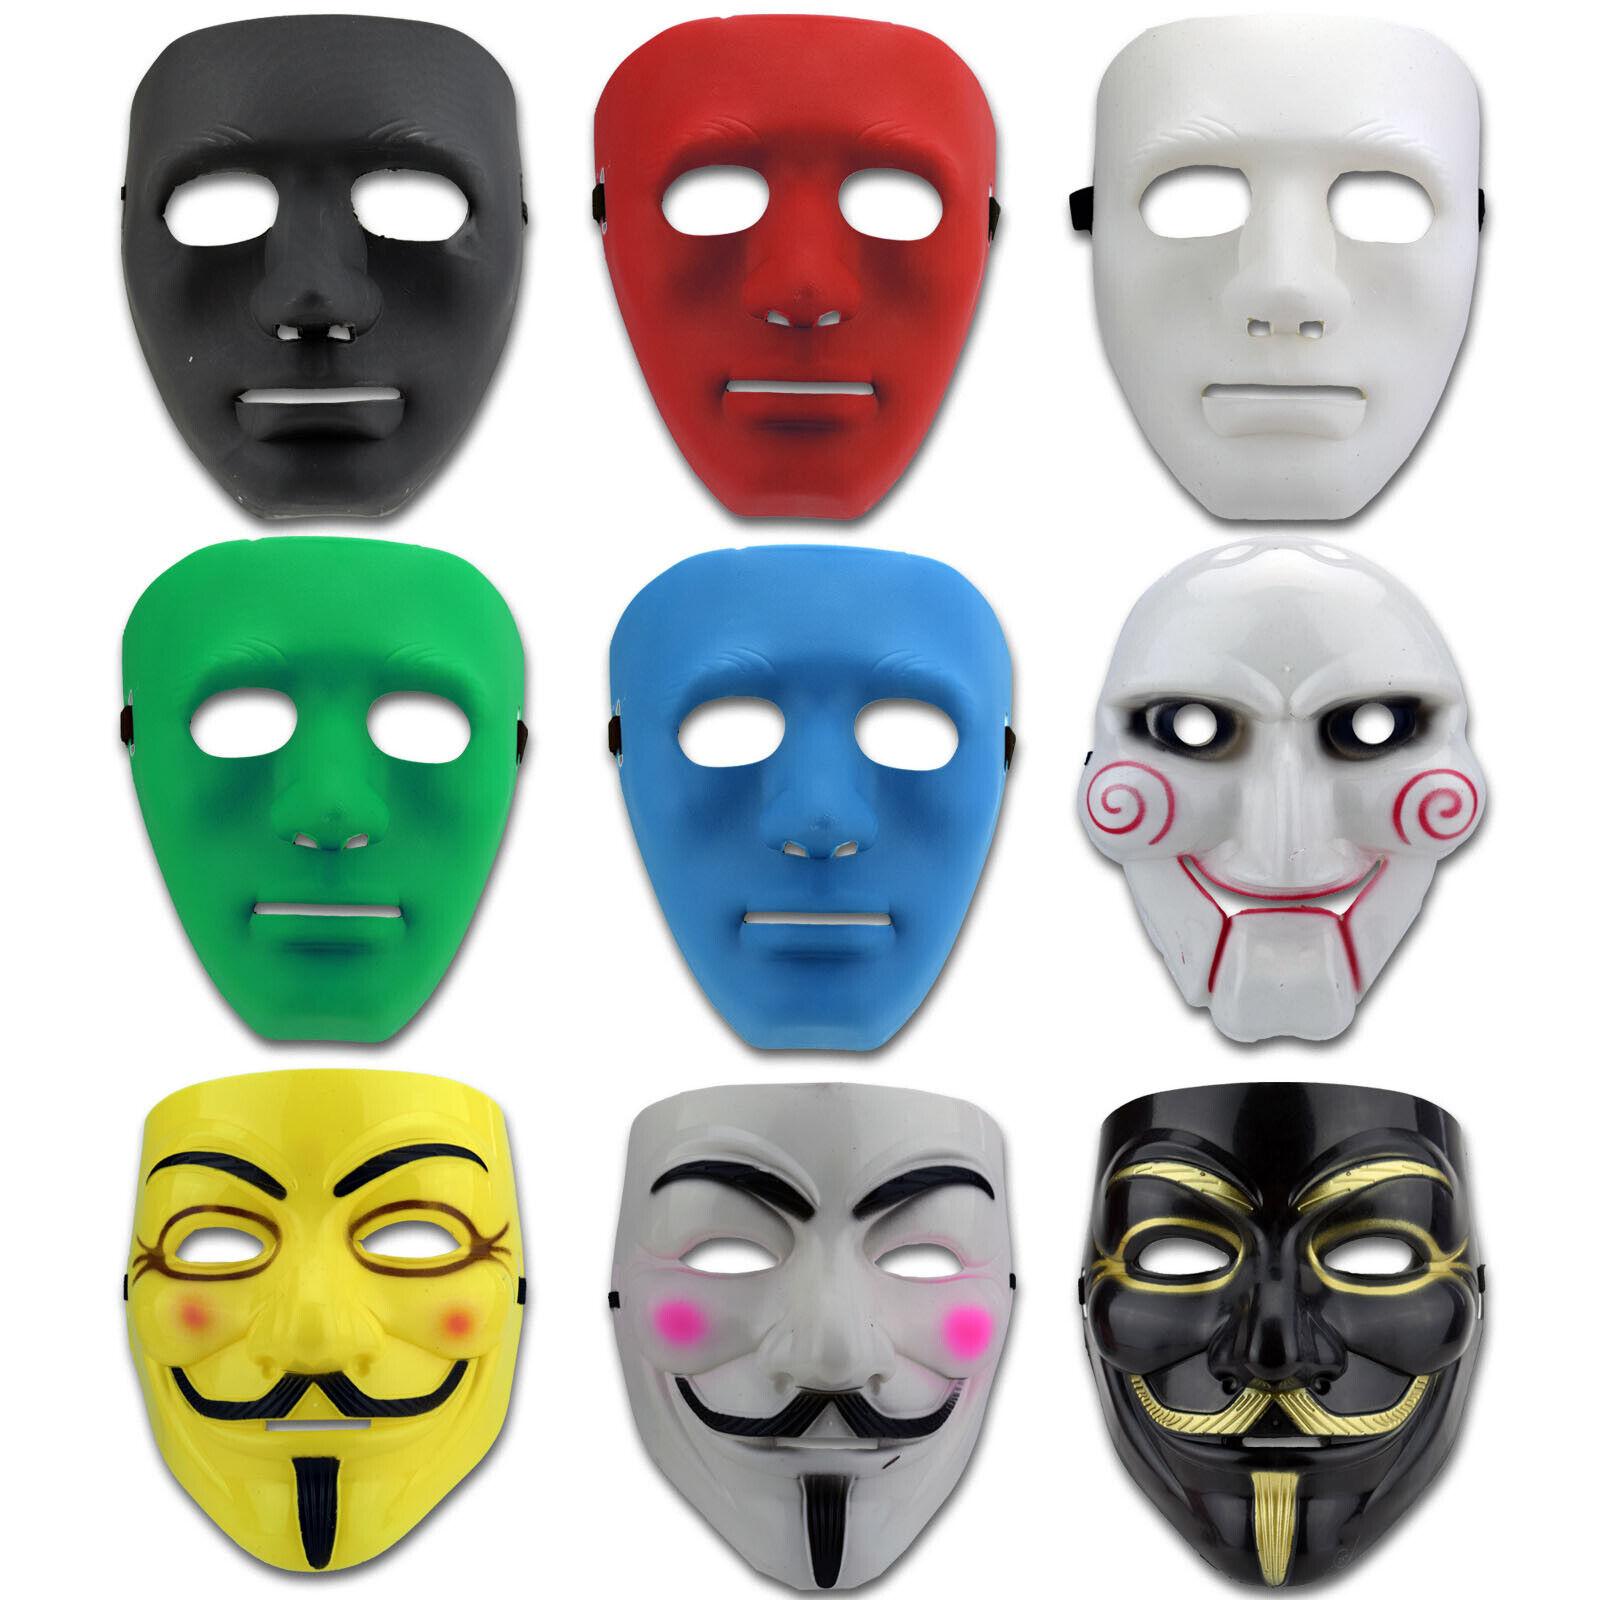 Halloween Maske Horror Vendetta SAW Kostüm Masken Karneval Fashing Gesichtsmaske